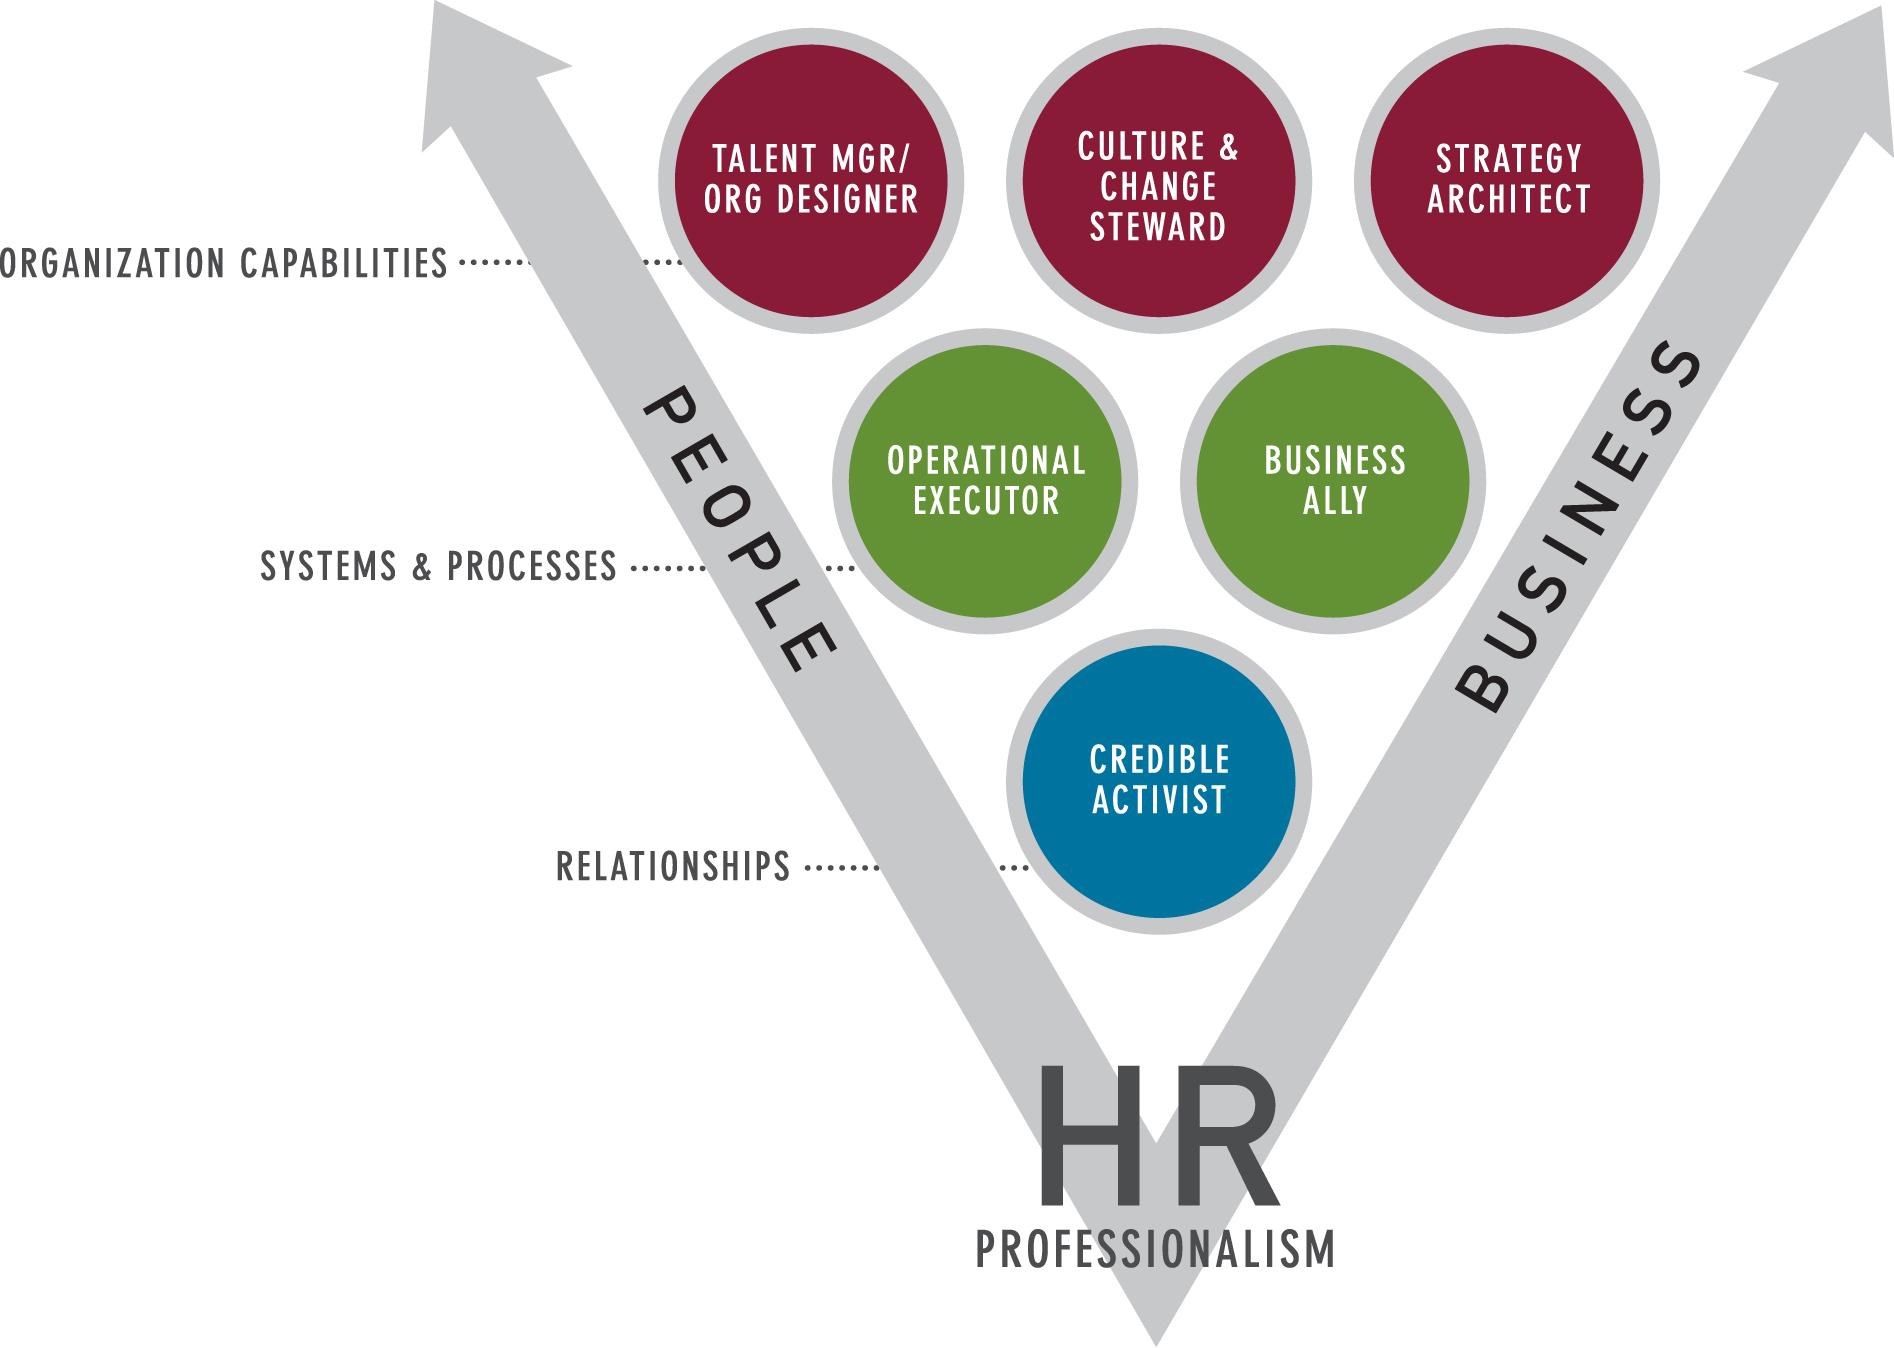 HR Competency Study Model 2007